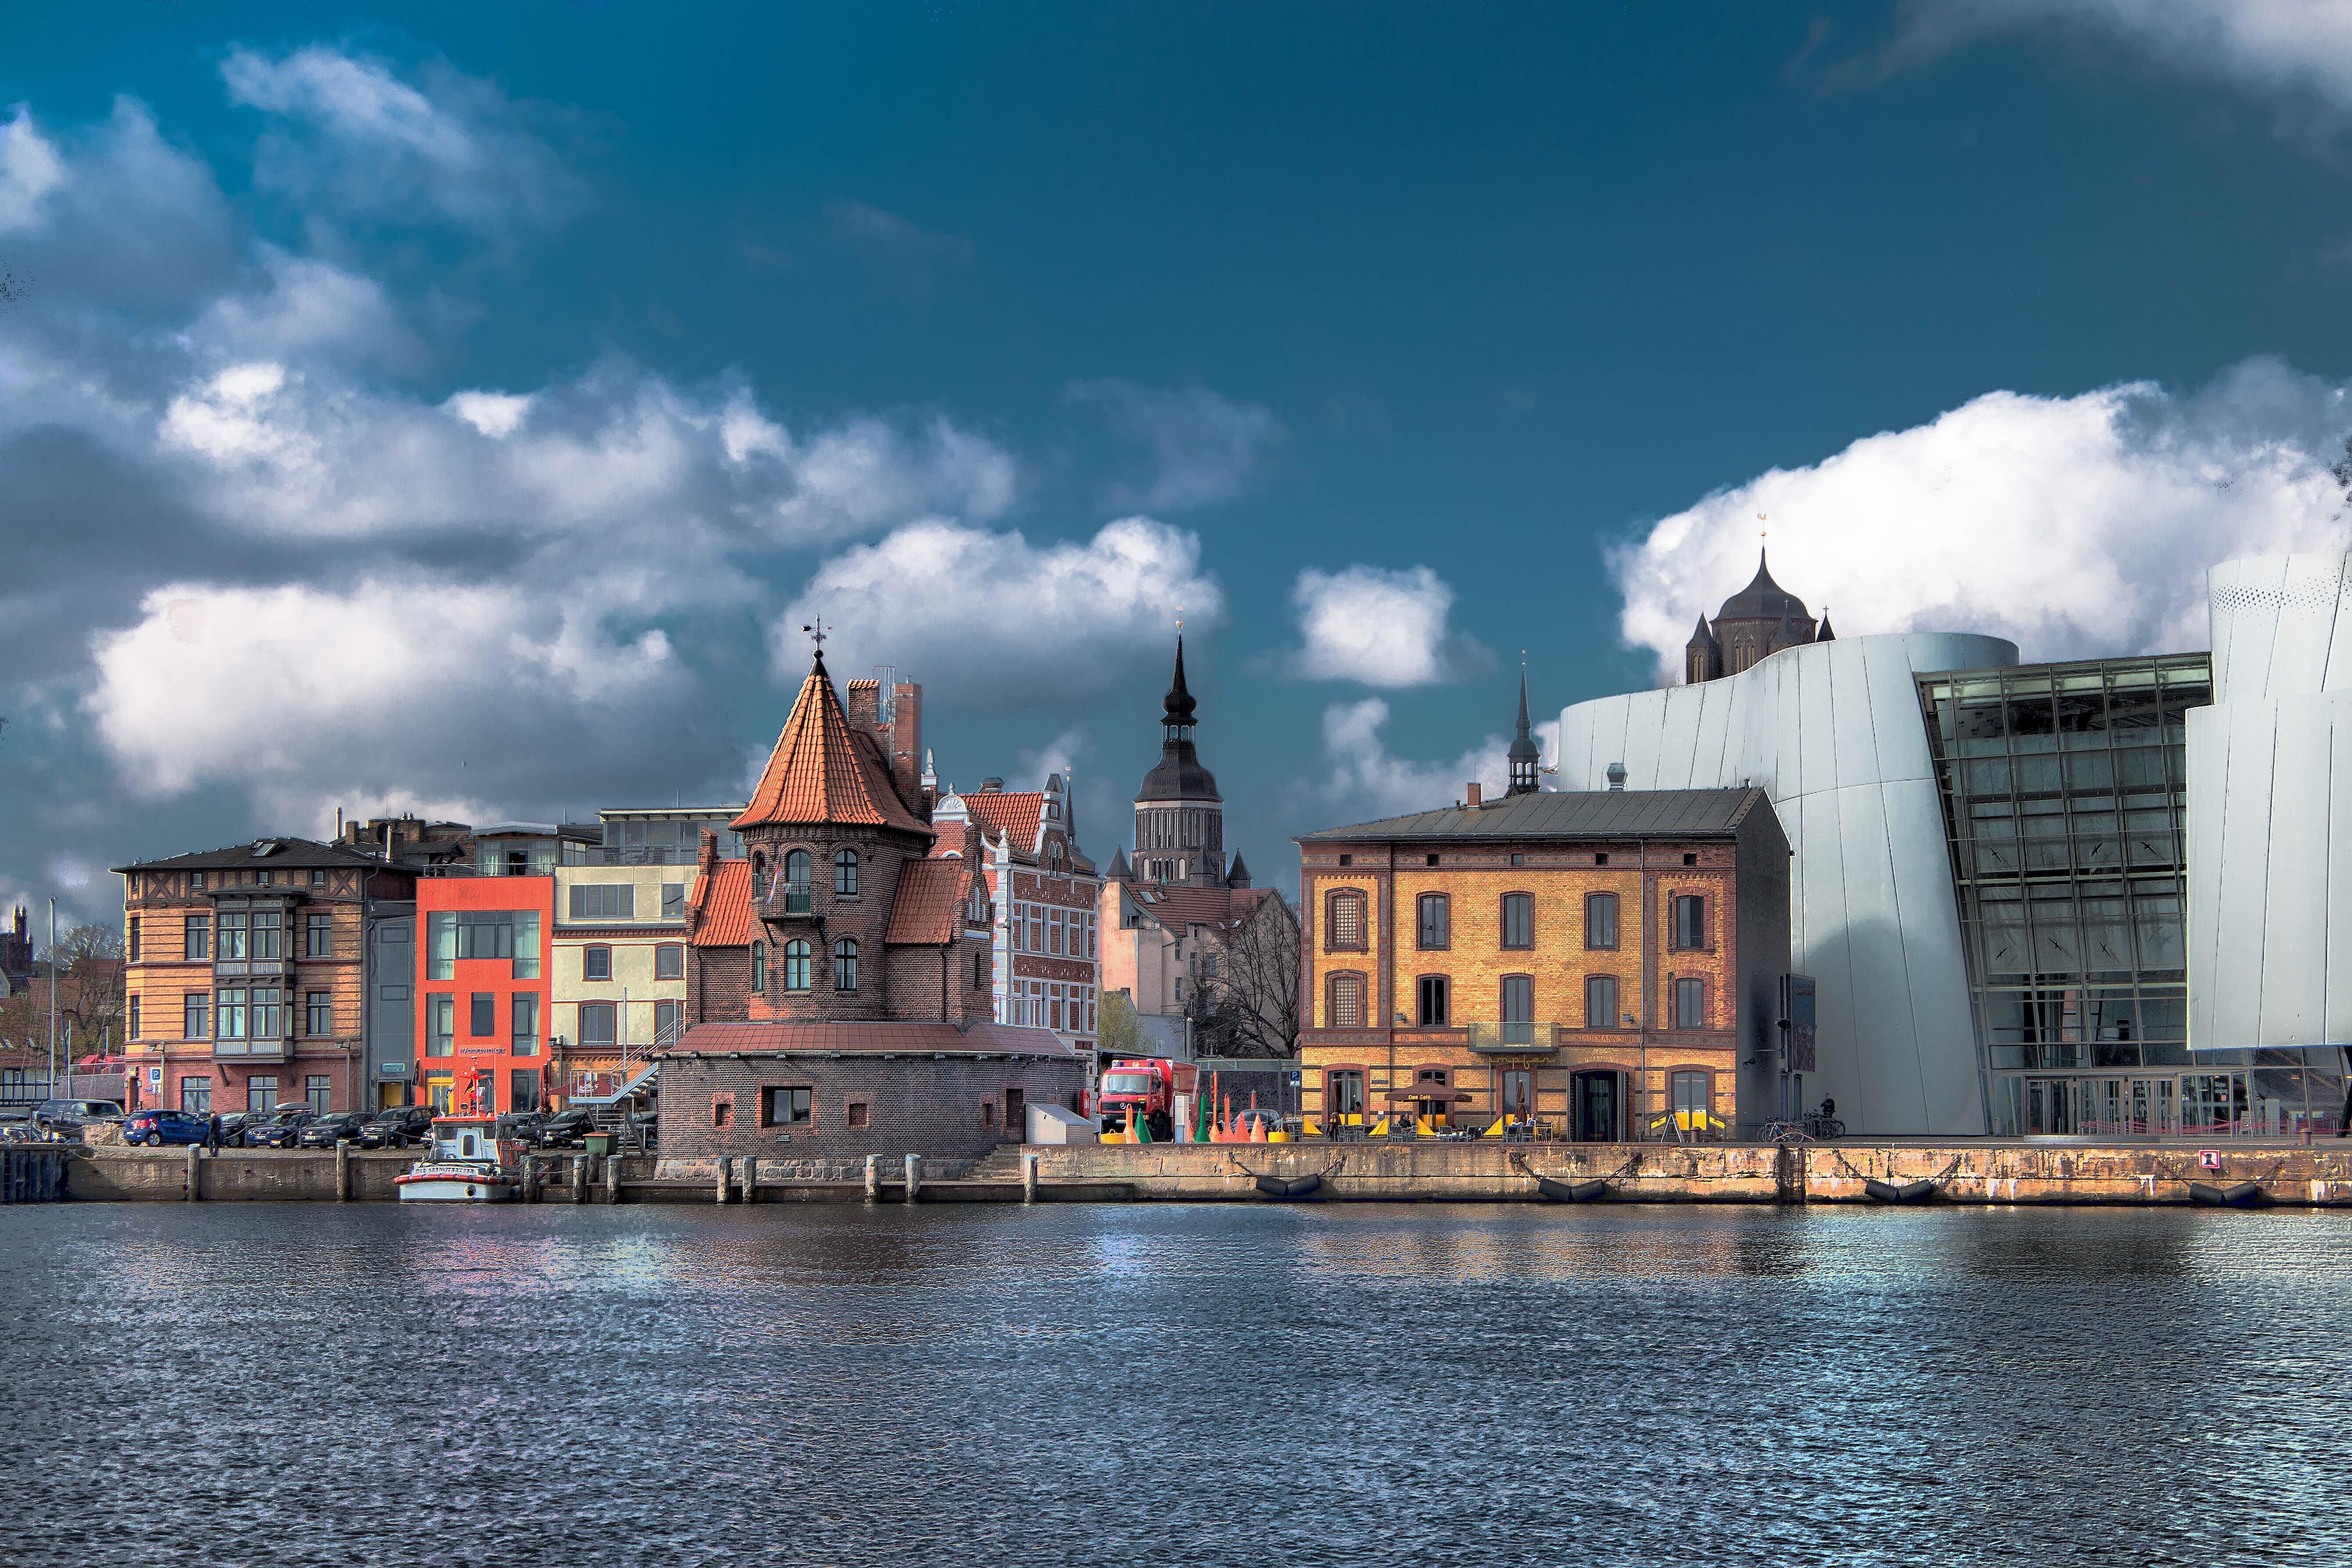 Photography of Landmark, Architecture, Water, Urban, Sky, HQ Photo